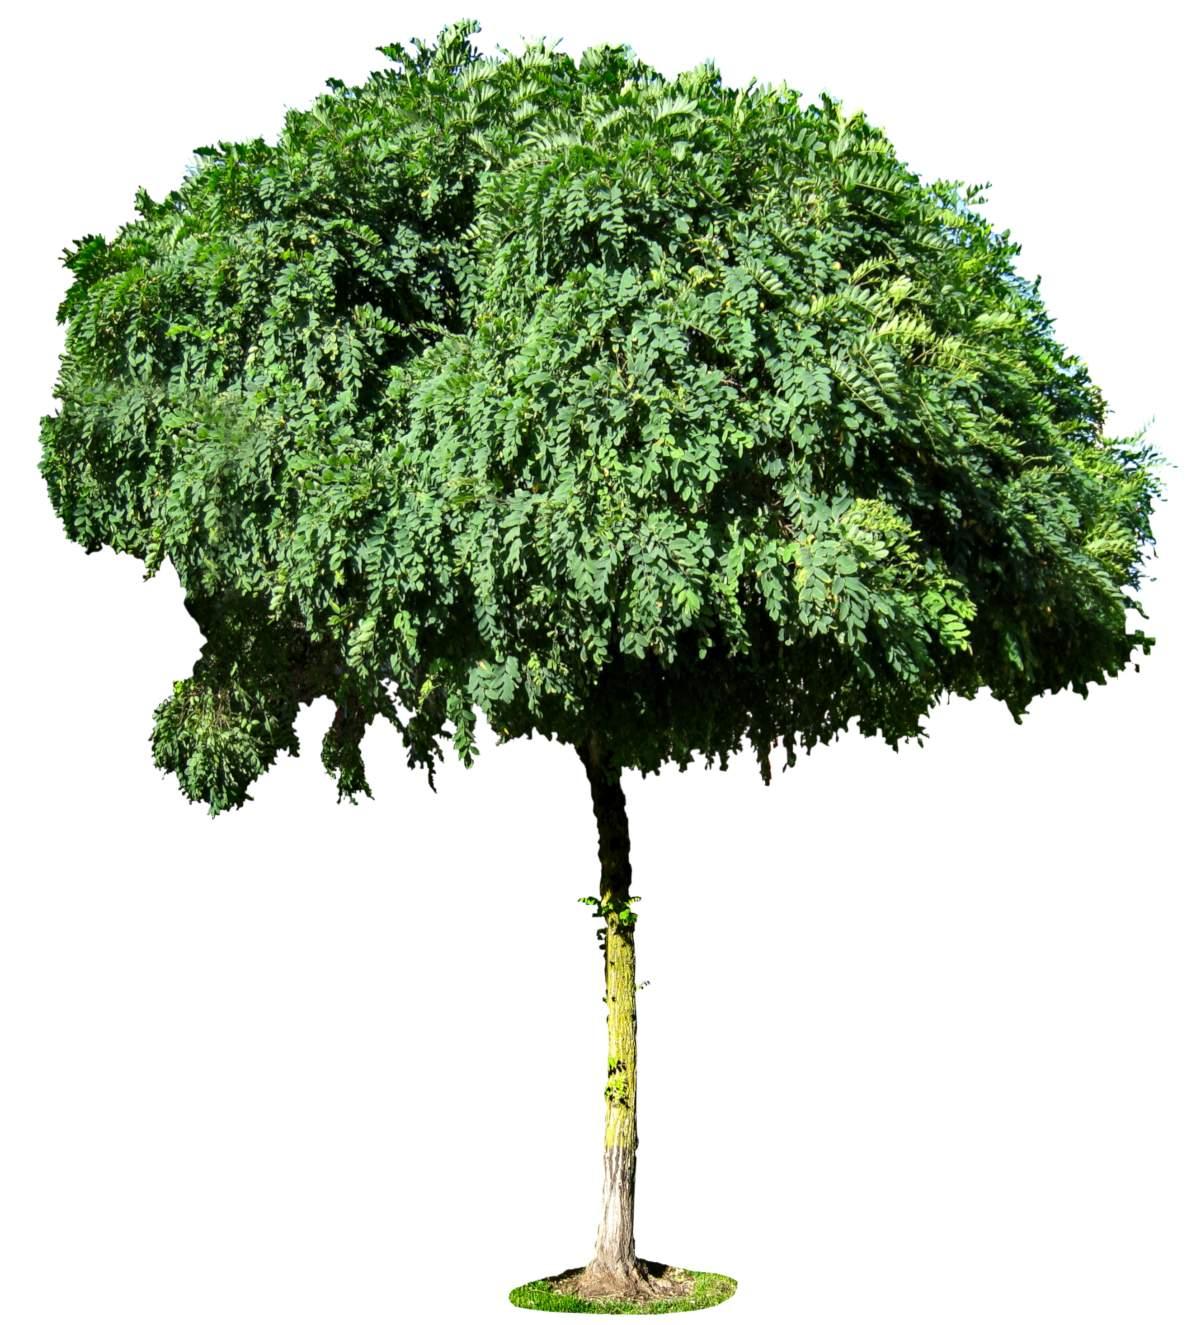 Delineated mophead acacia tree